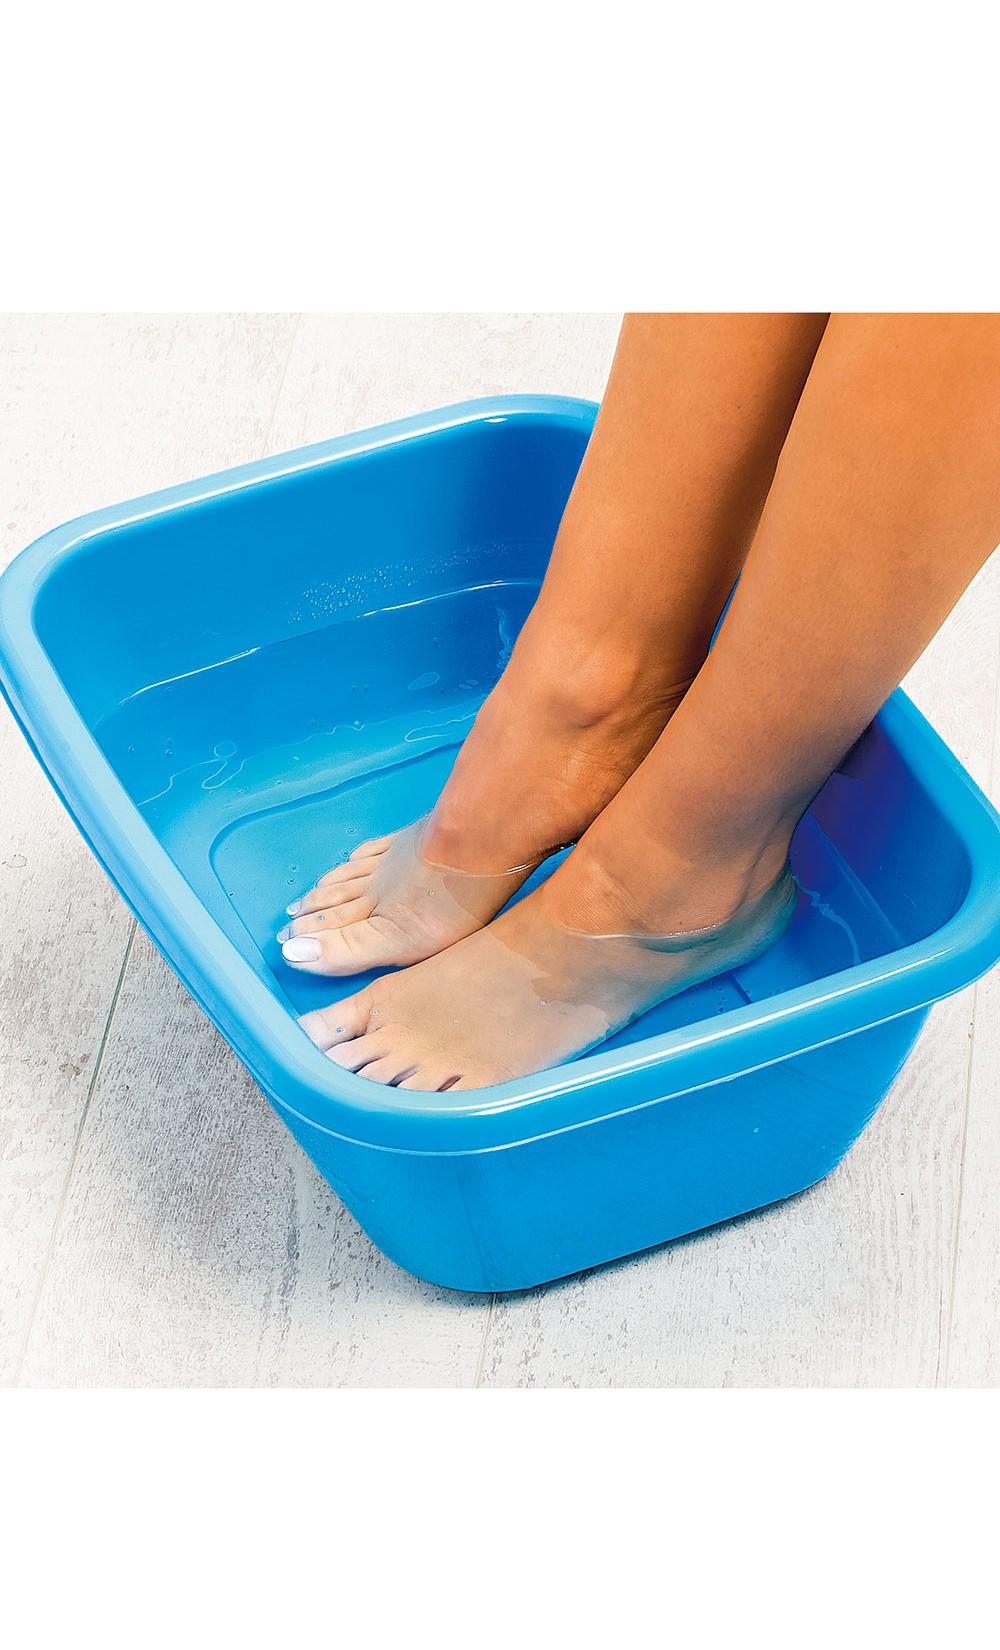 bain de pieds - GEPIDE